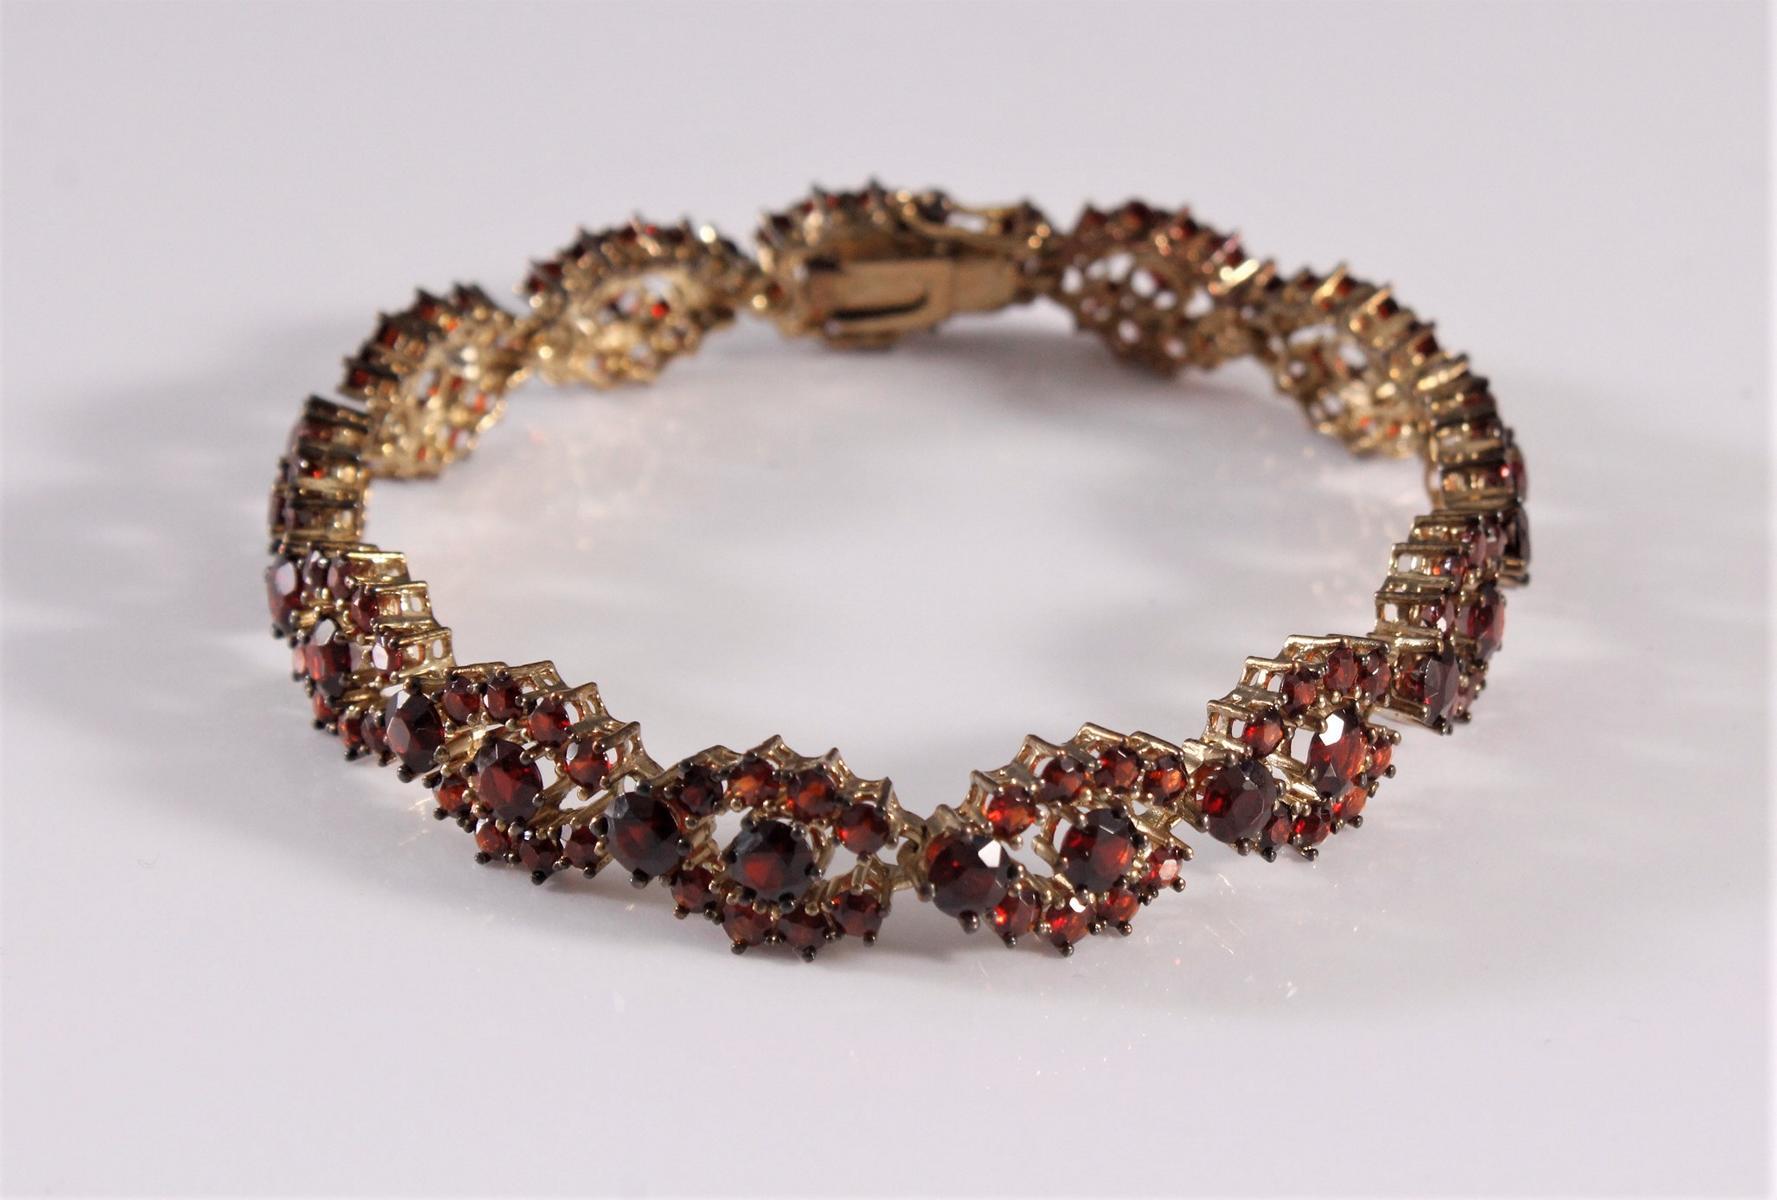 Damenarmband mit Granaten, Böhmen 1. Hälfte 20. Jh. 8 kt Gelbgold